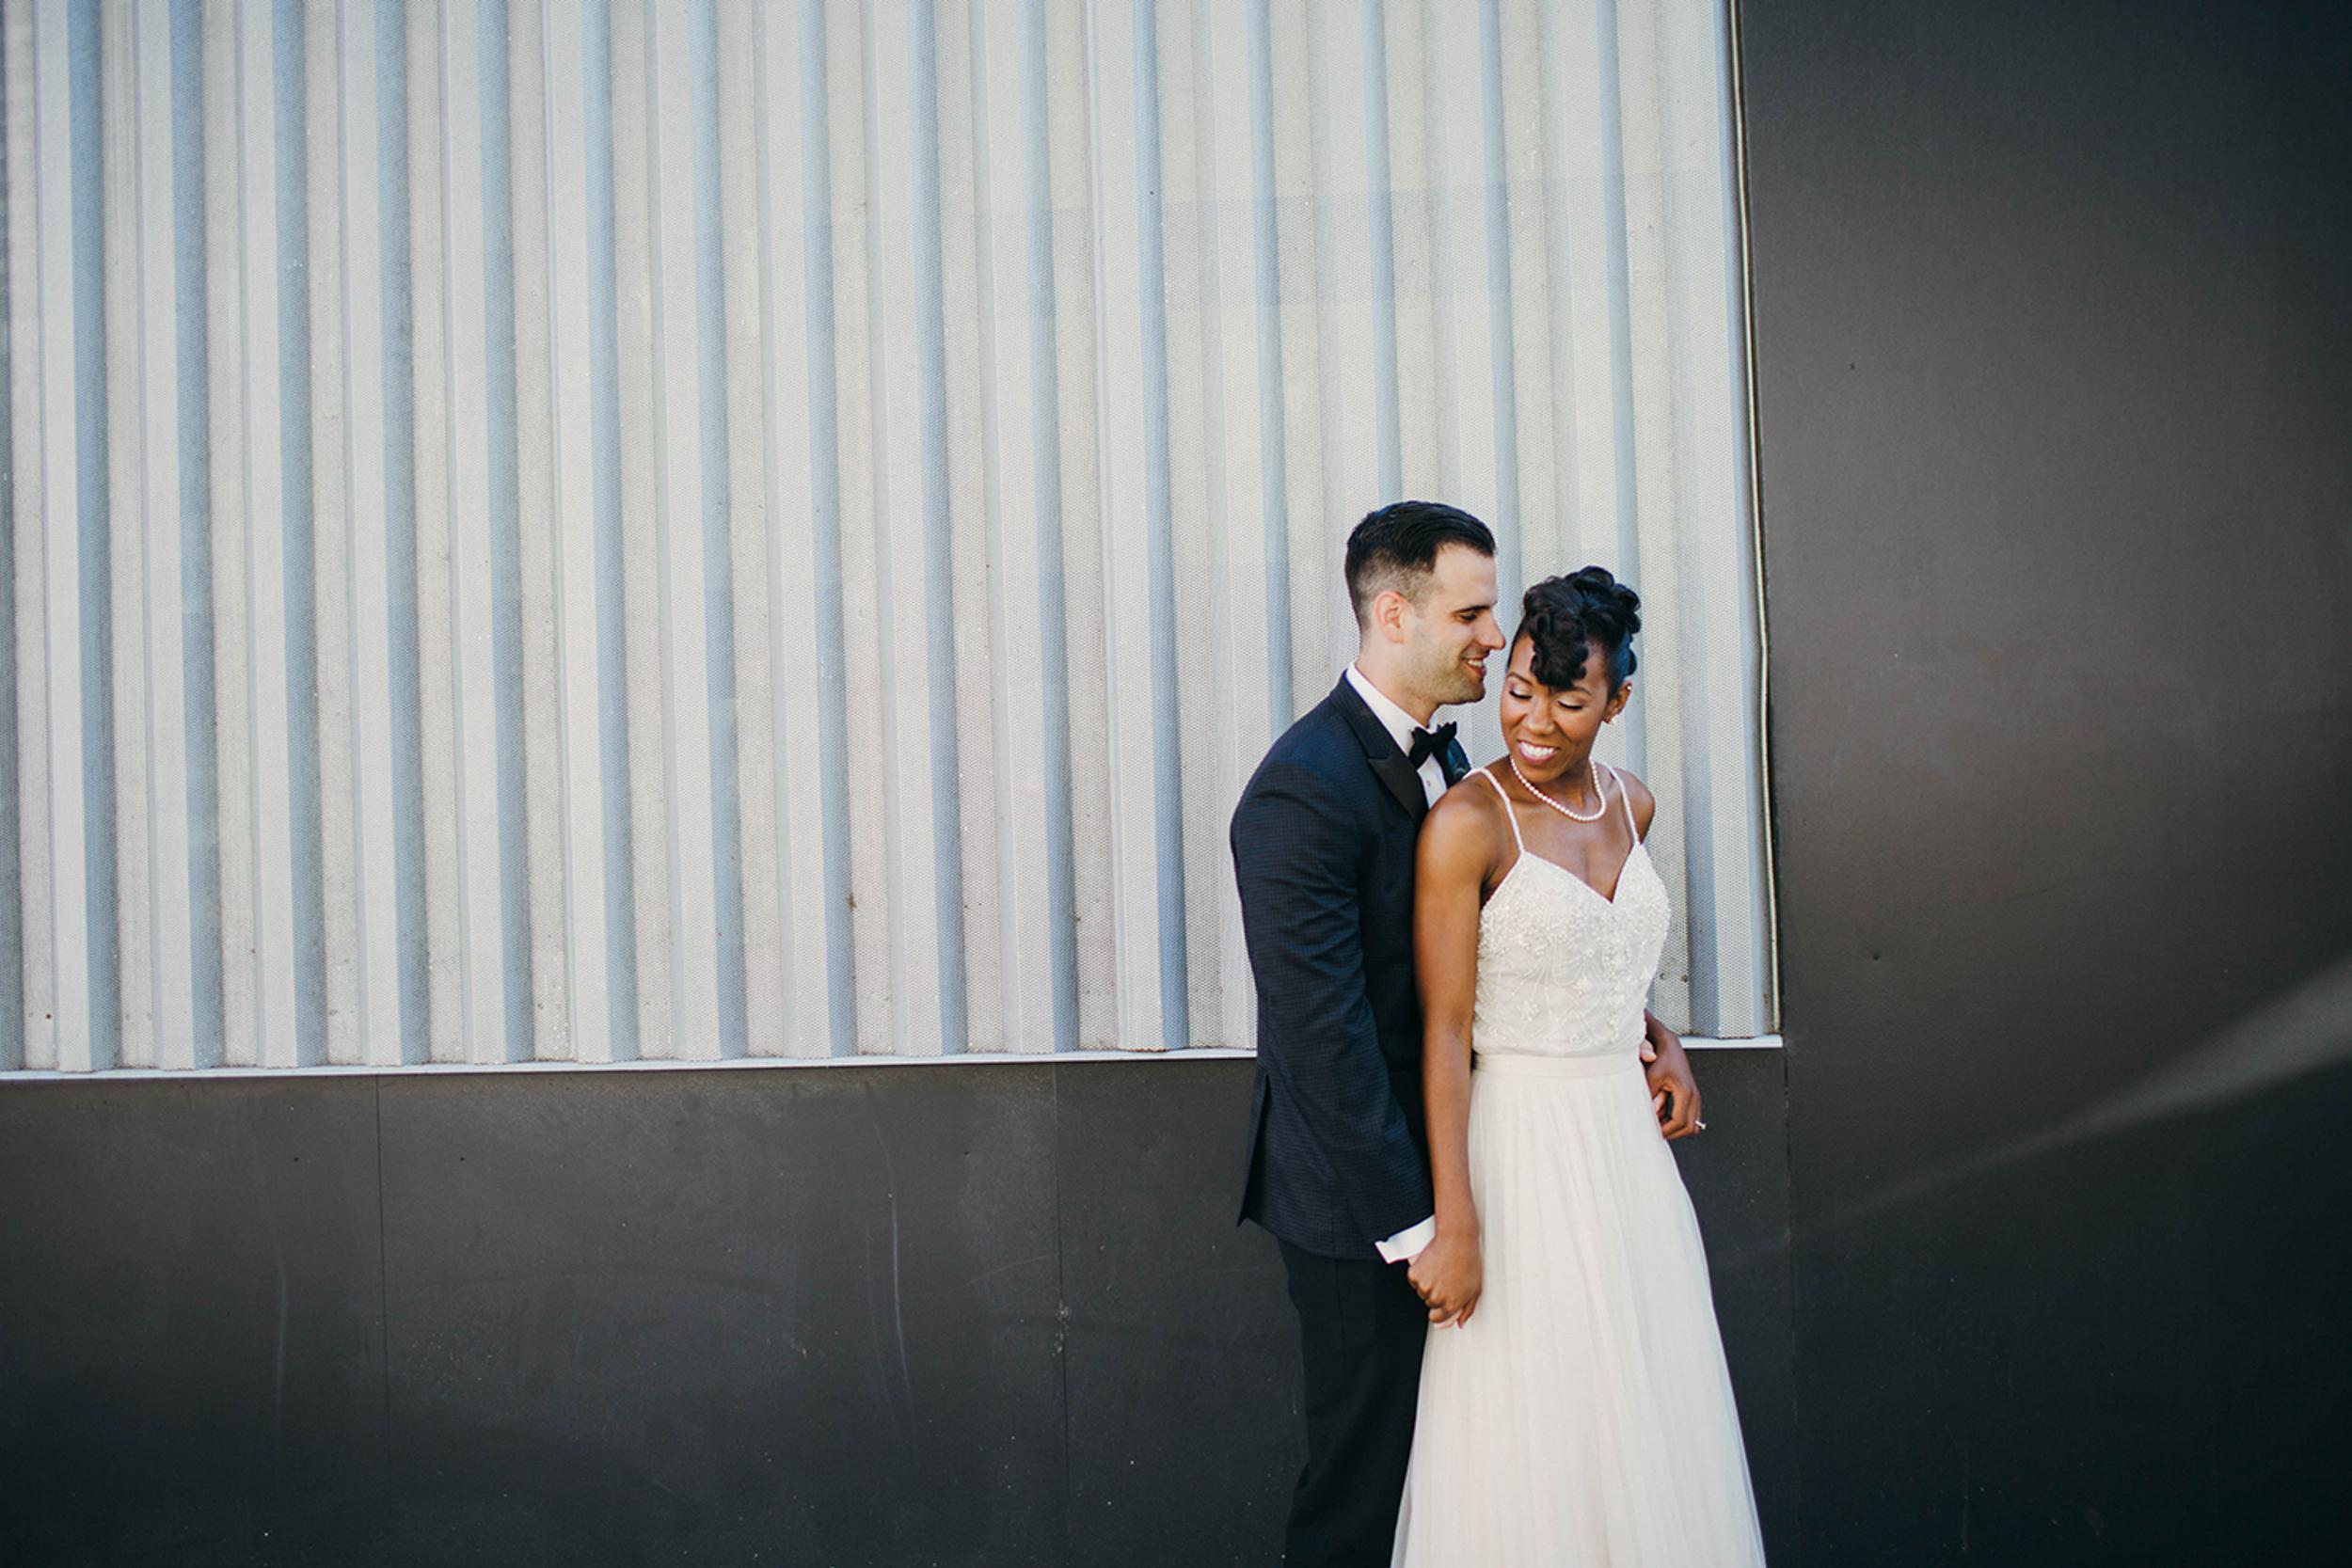 chicago.wedding.urban.intimate.zed451.lake.milton olive park-36.jpg